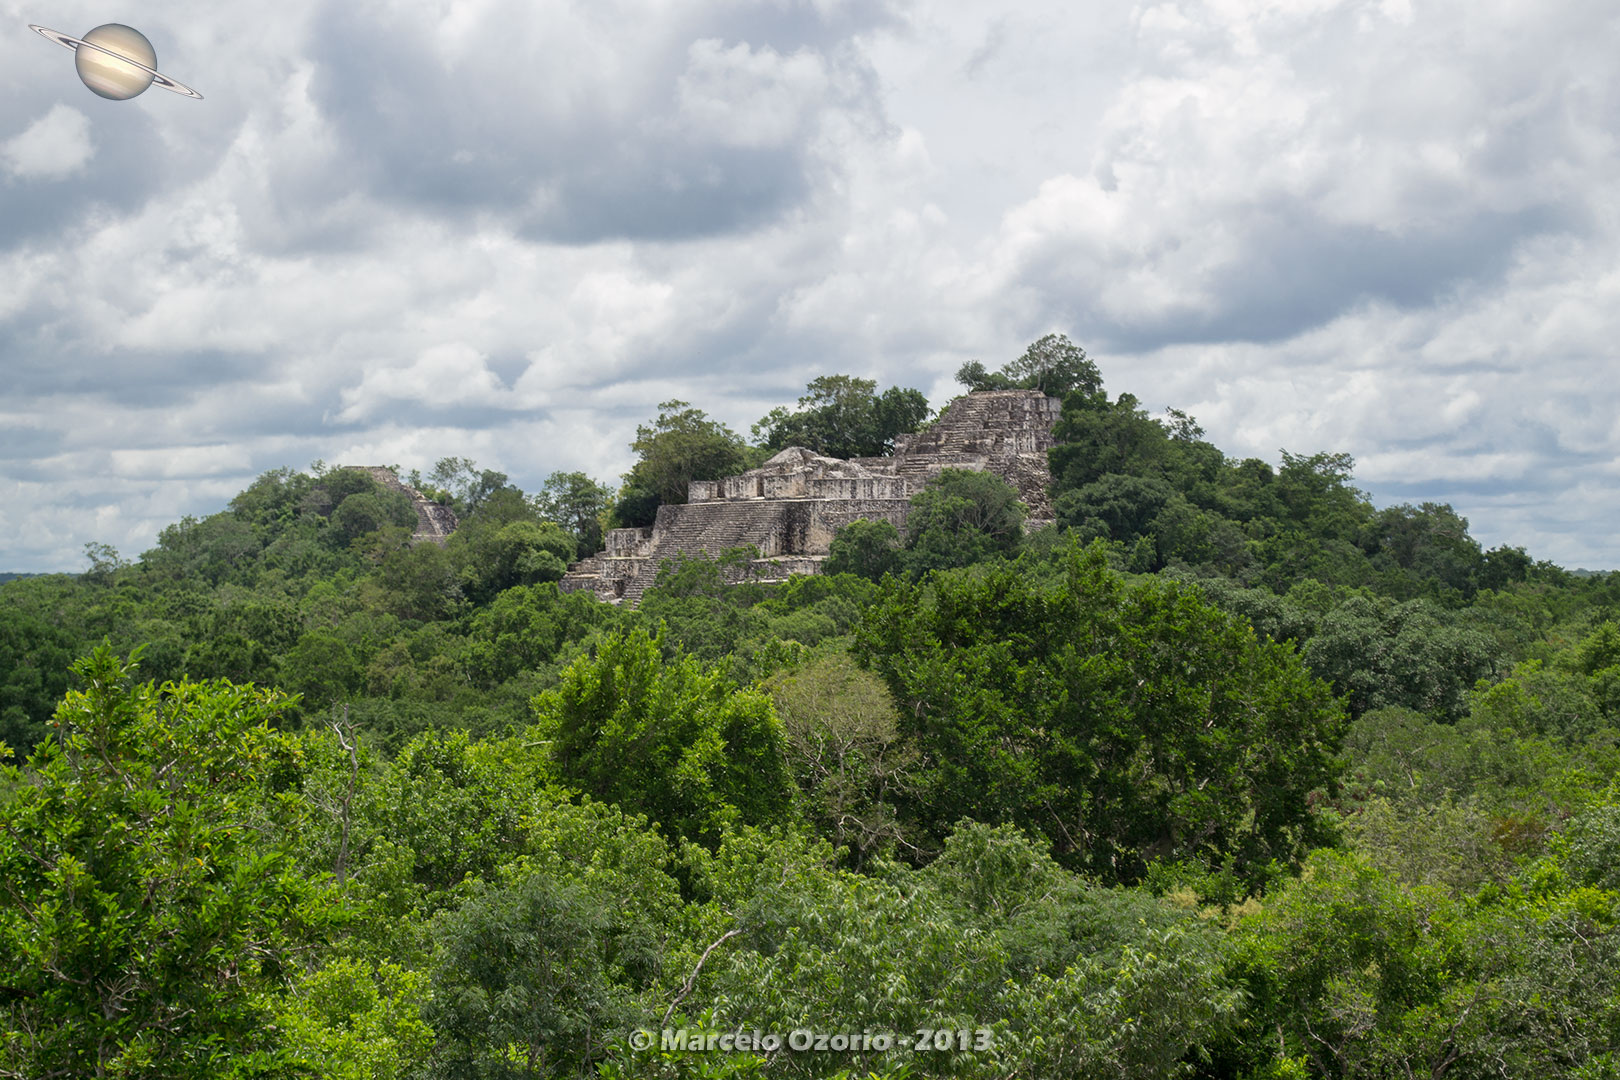 calakmul mayan civilization mexico 43 - Calakmul, City of the Two Adjacent Pyramids - Mexico